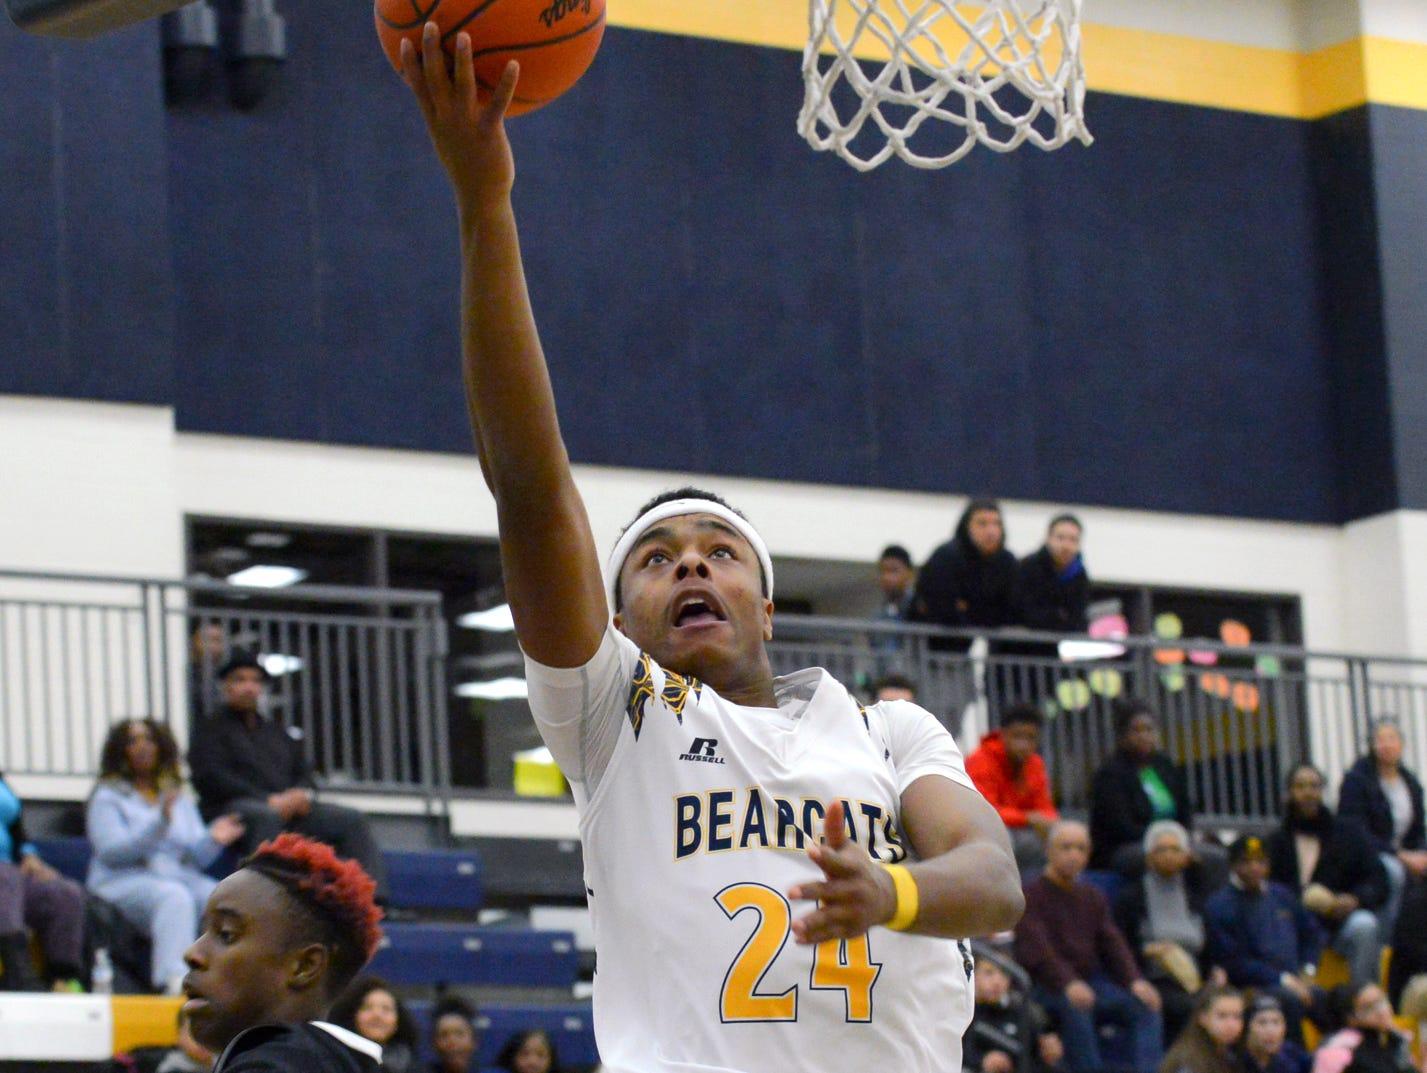 Battle Creek's Cyntell Williams drives the basket Tuesday night.